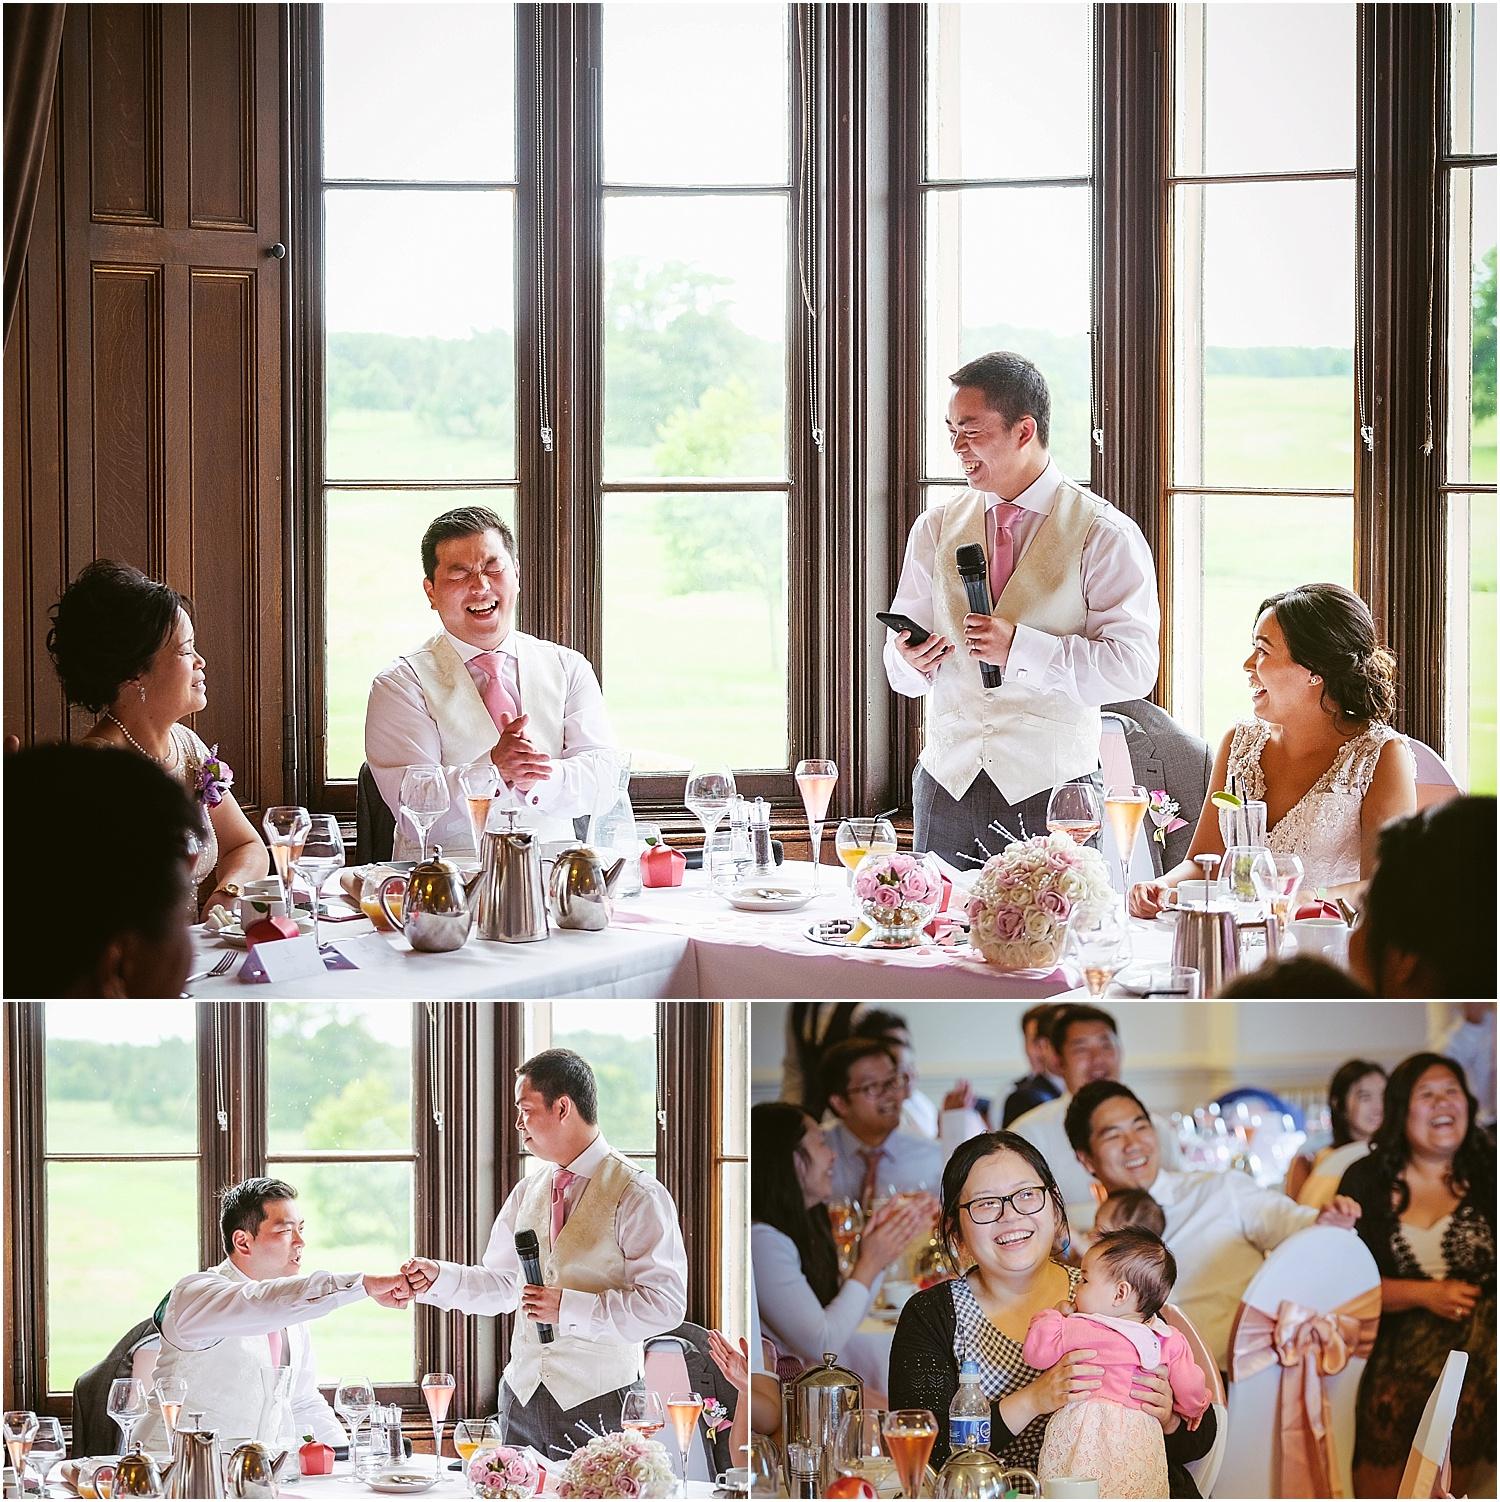 Matfen Hall wedding photography photography by www.2tonephotography.co.uk 072.jpg